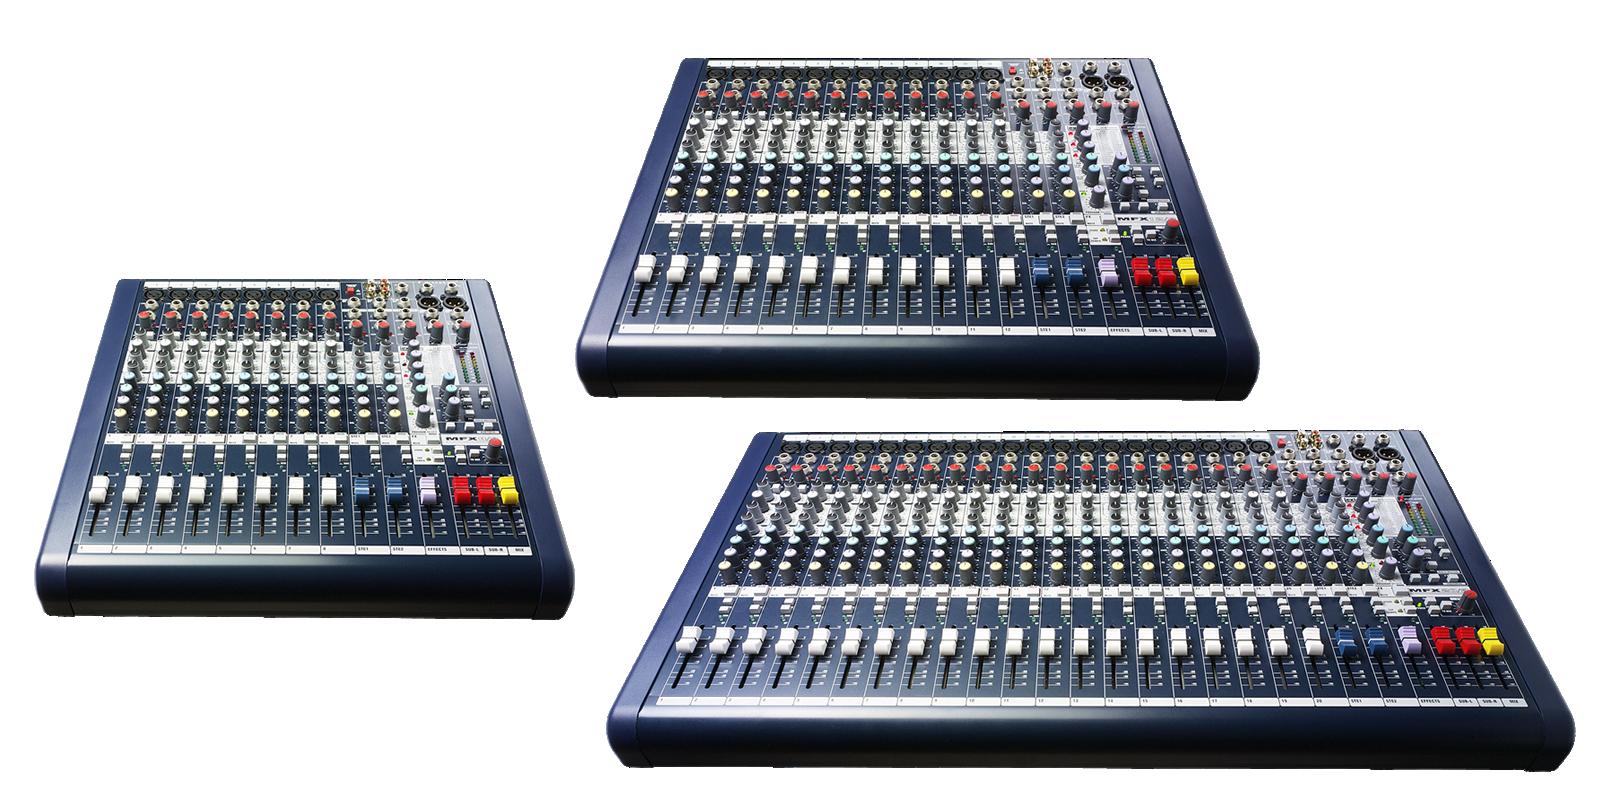 mfx soundcraft professional audio mixers. Black Bedroom Furniture Sets. Home Design Ideas